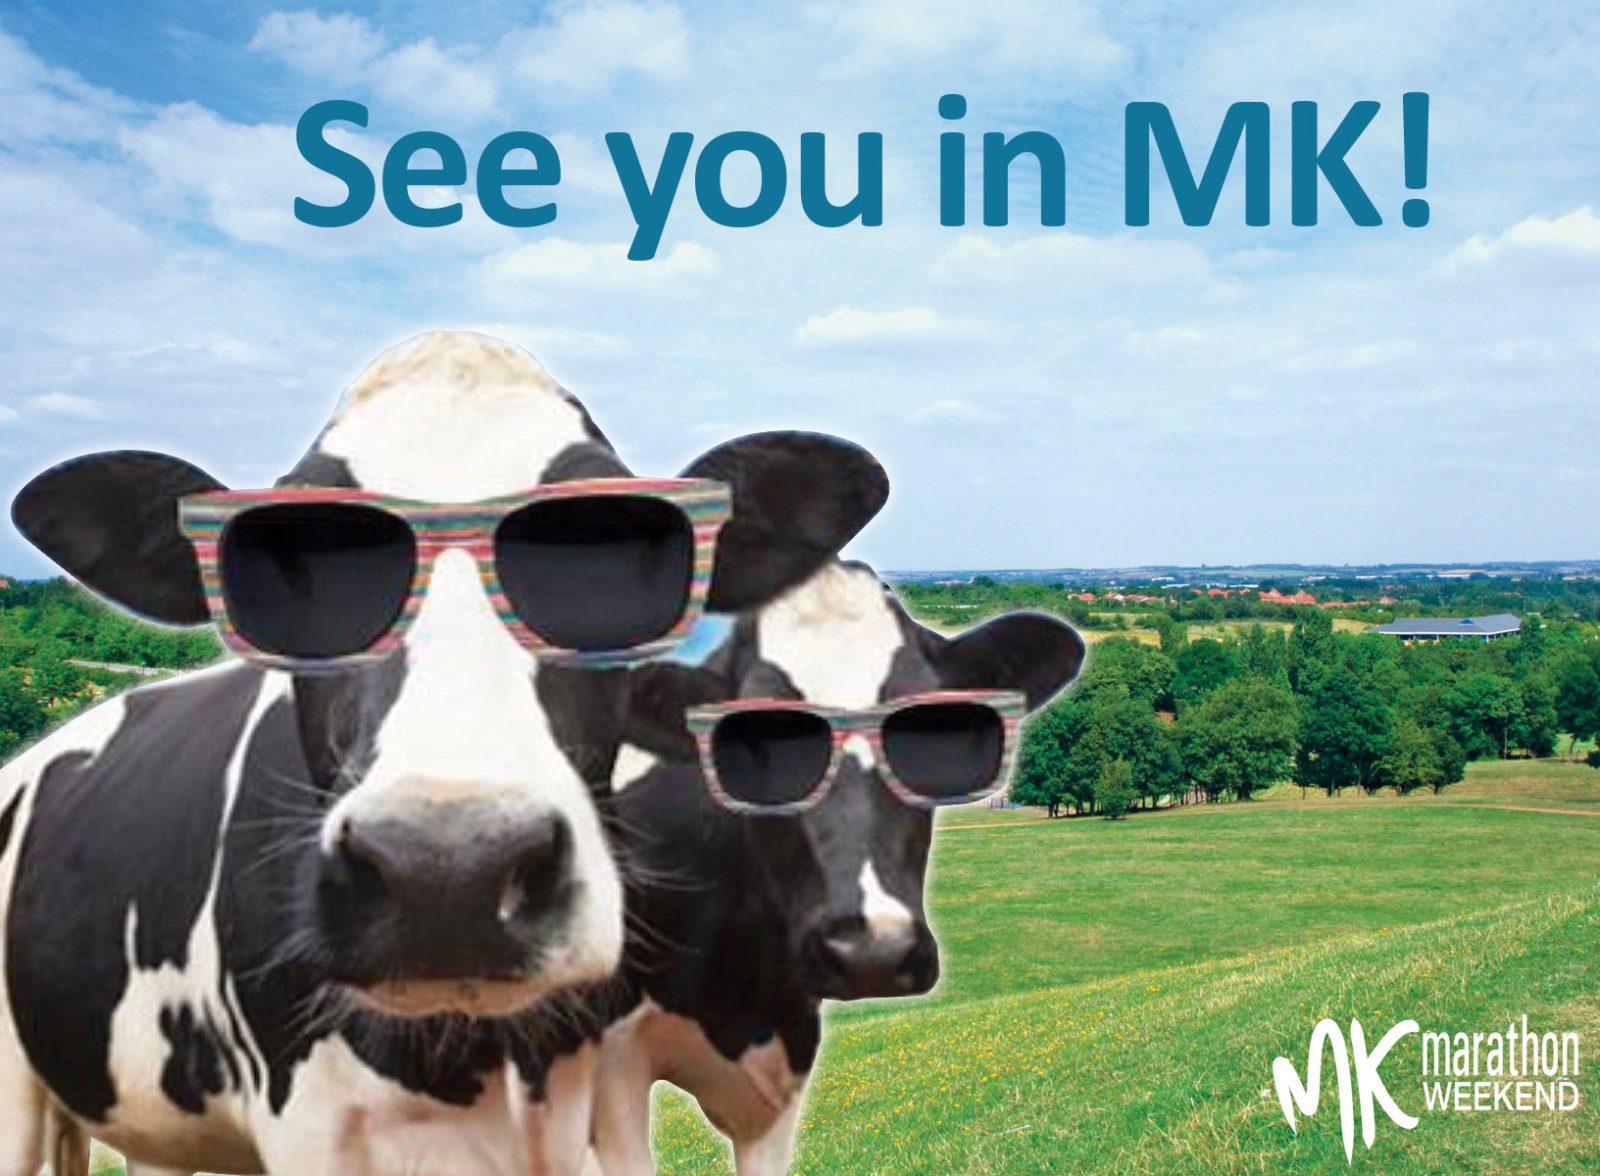 See you at the MK Marathon